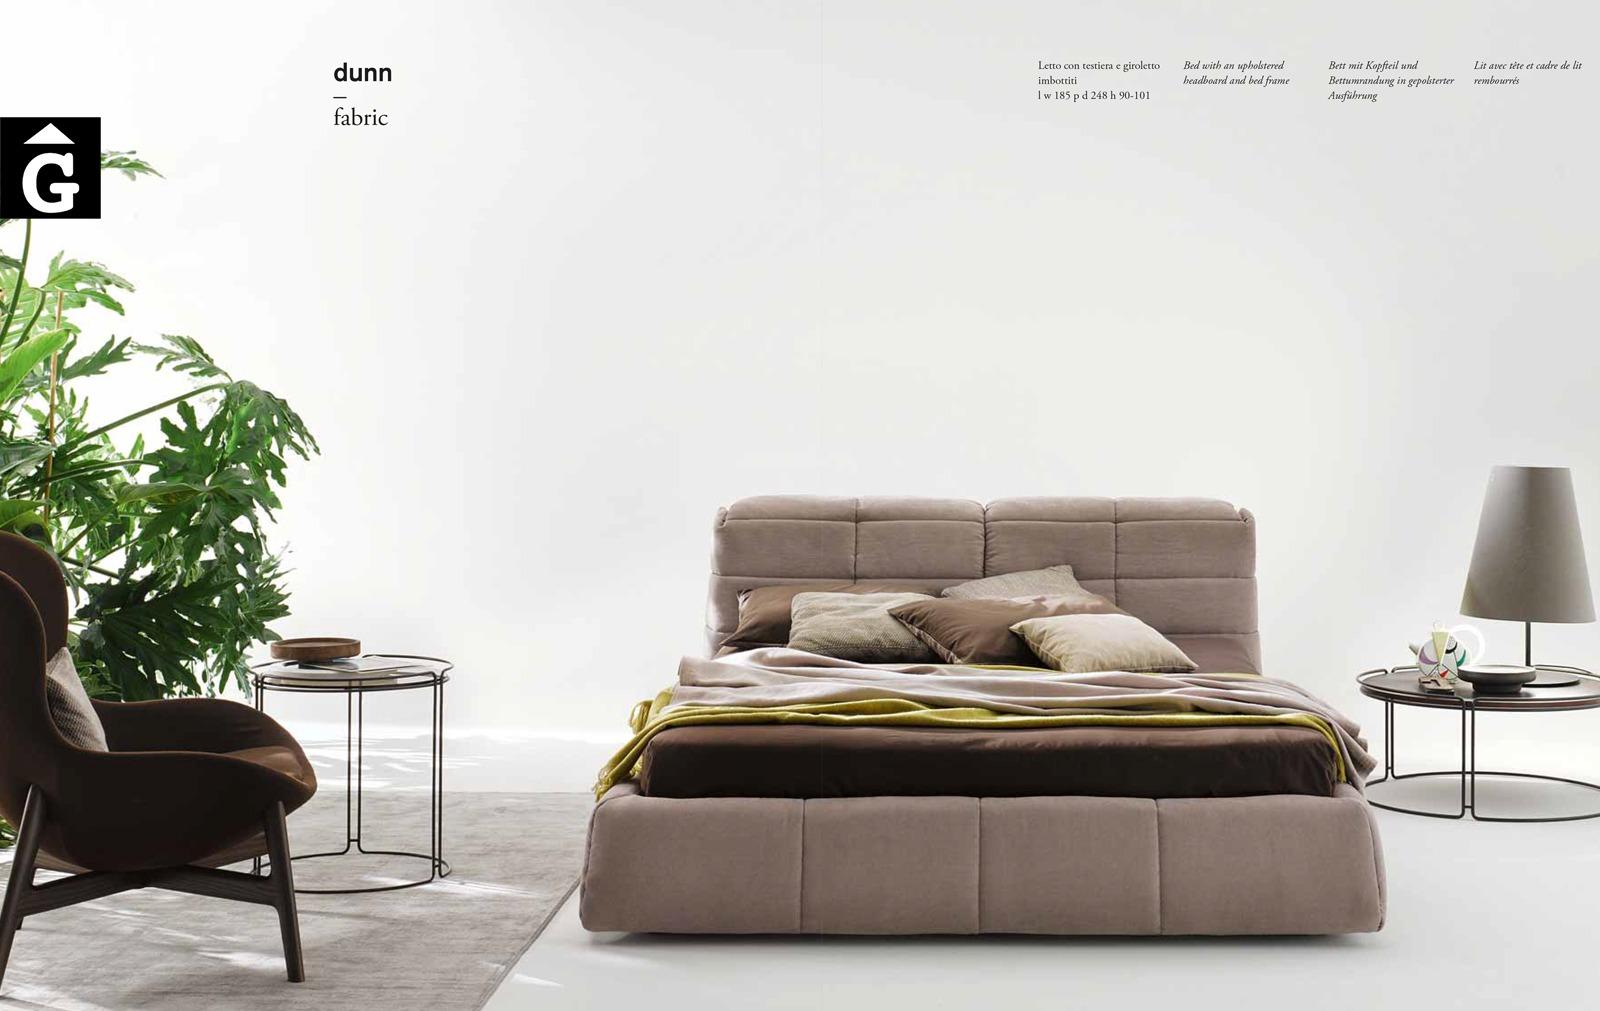 Dunn Llit entapissat gran fons blanc – Ditre Italia llits entapissats disseny i qualitat alta by mobles Gifreu